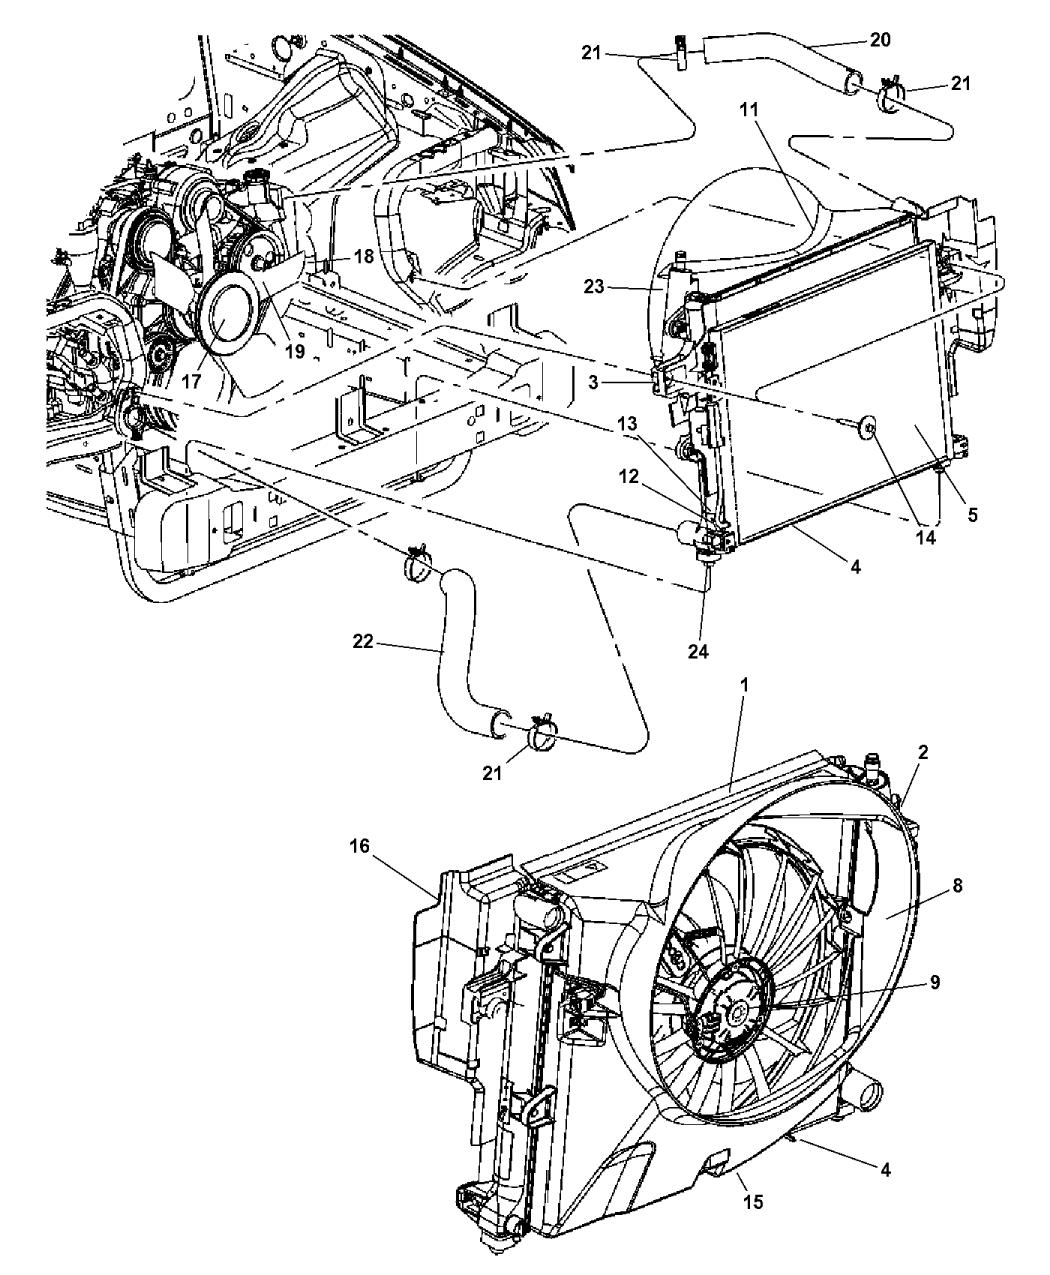 2007 Jeep Grand Cherokee Radiator & Related Parts